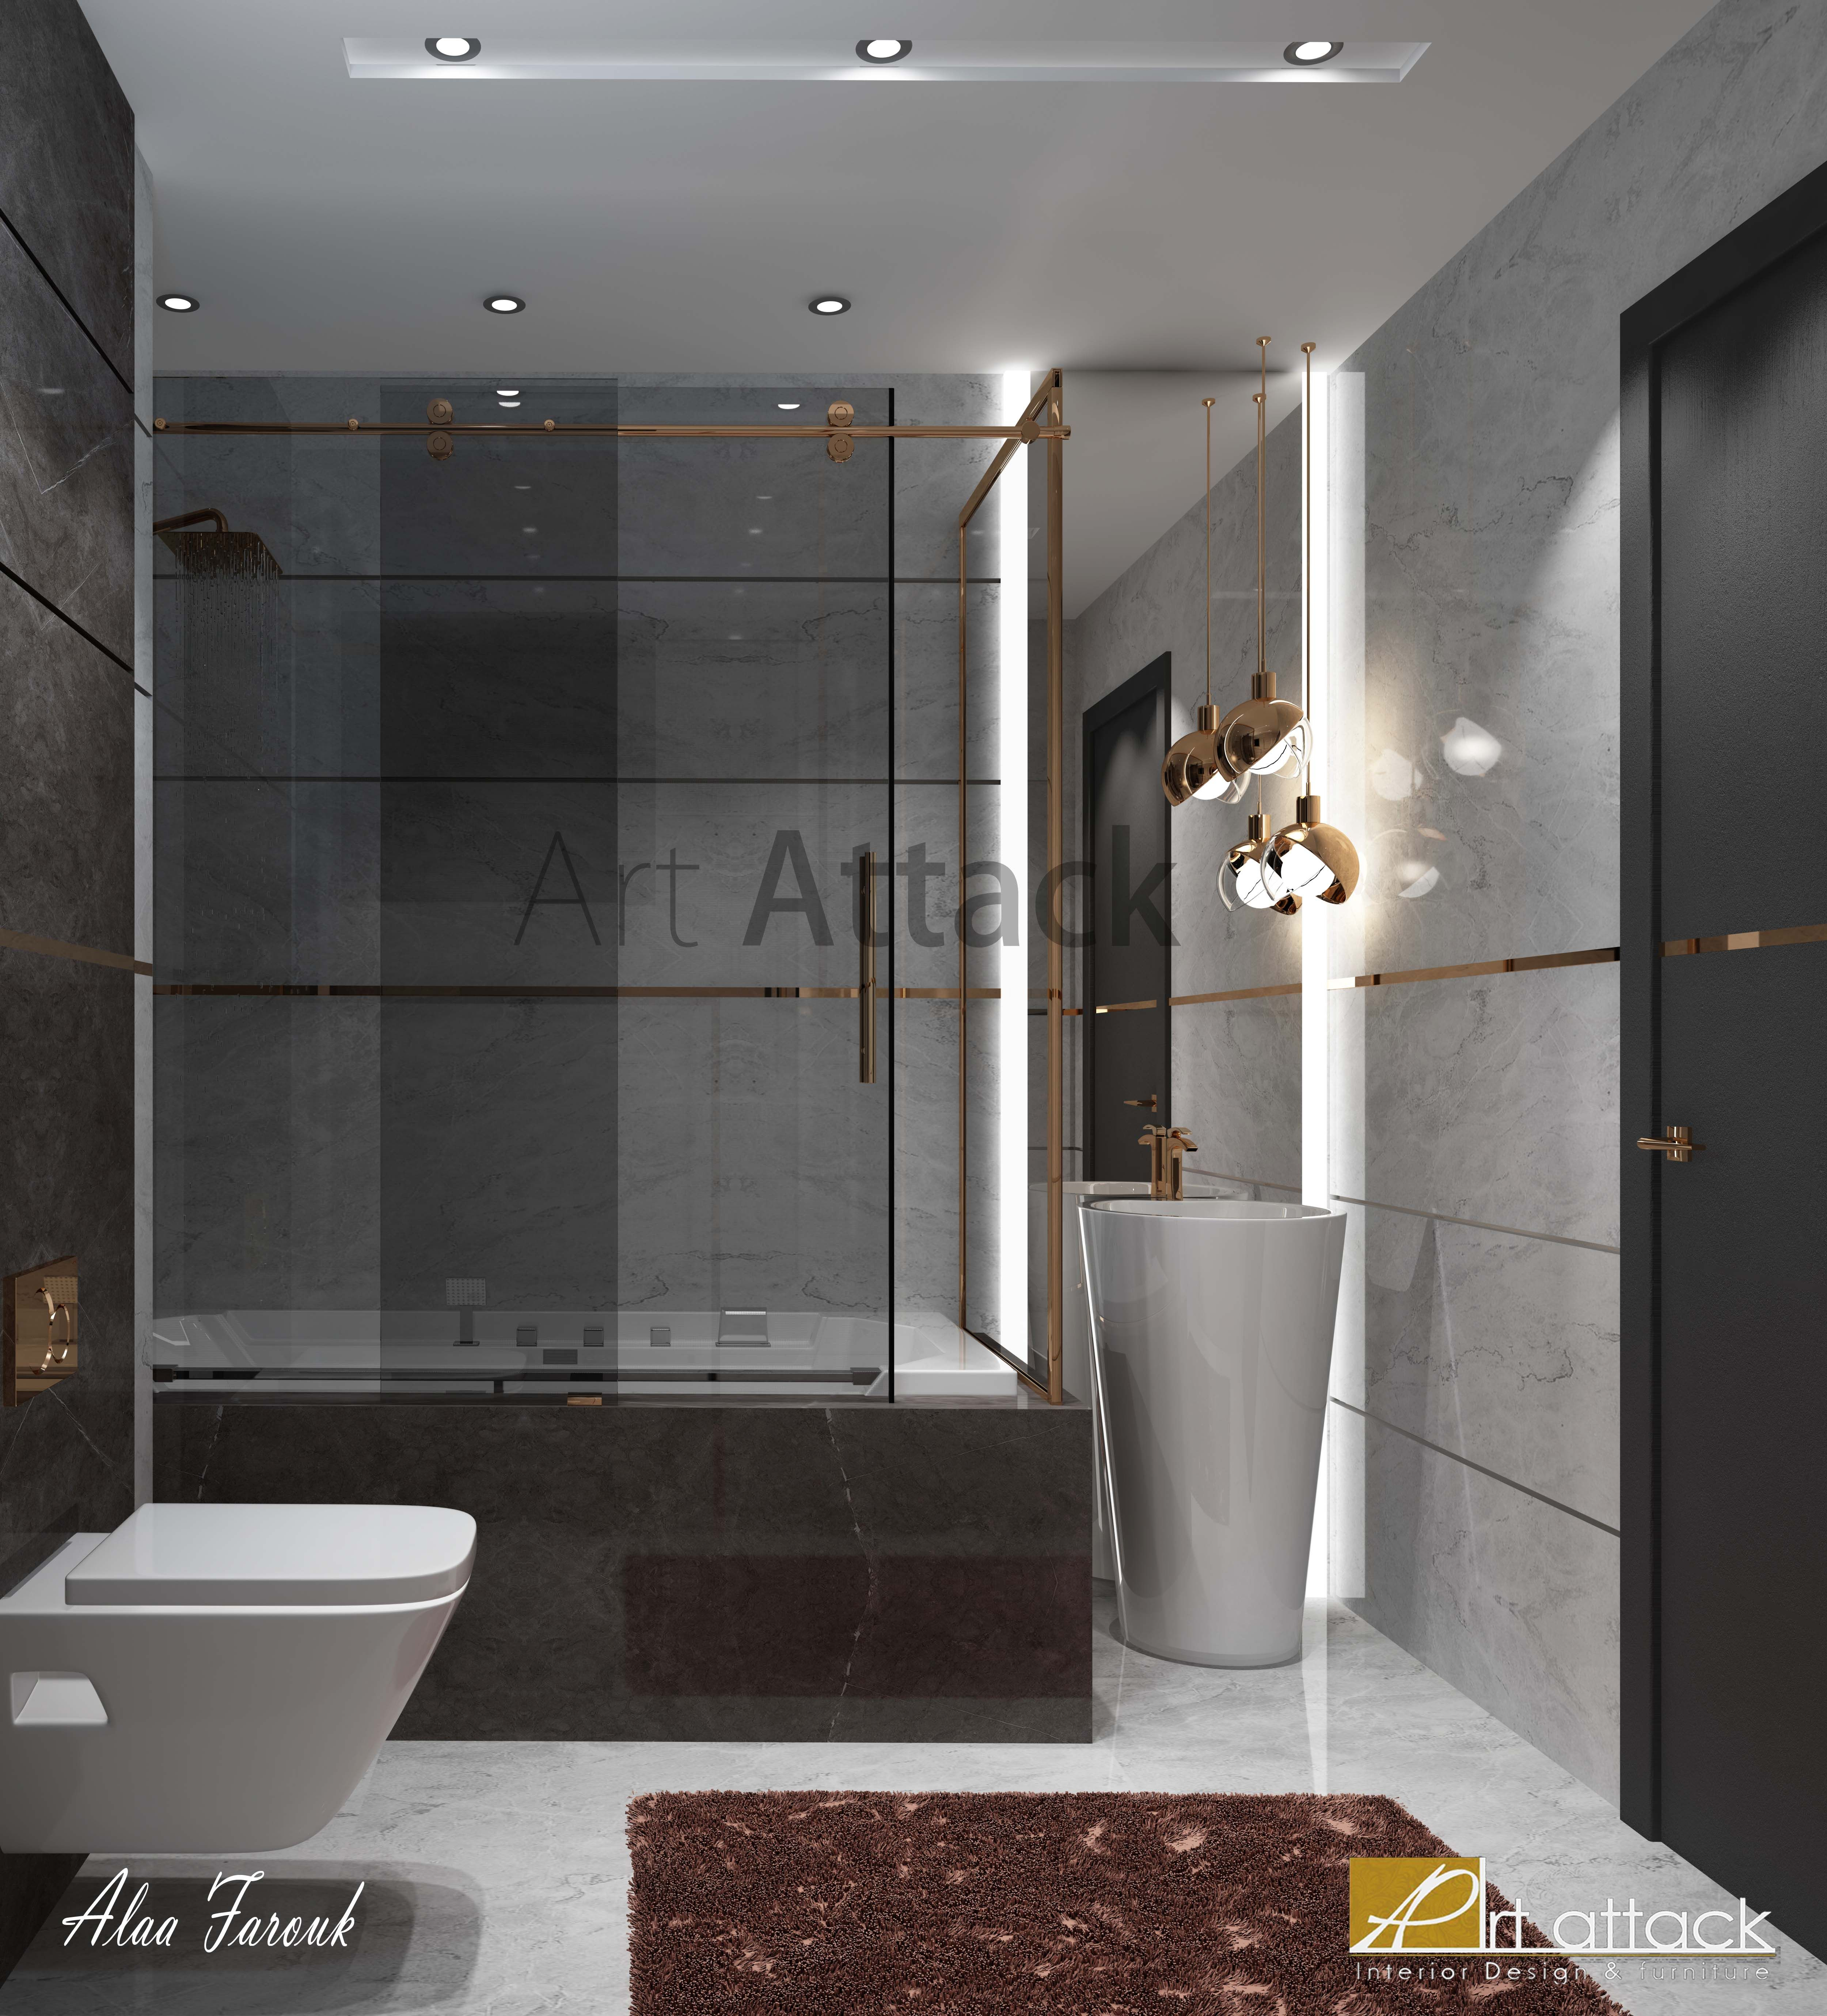 Interior Design Design Art Attack My Room شقق سبا باشا مودرن تصميم تصميم داخلي Apartment Decoration Decor Luxurydesign Modern Dr Bathroom Bathtub